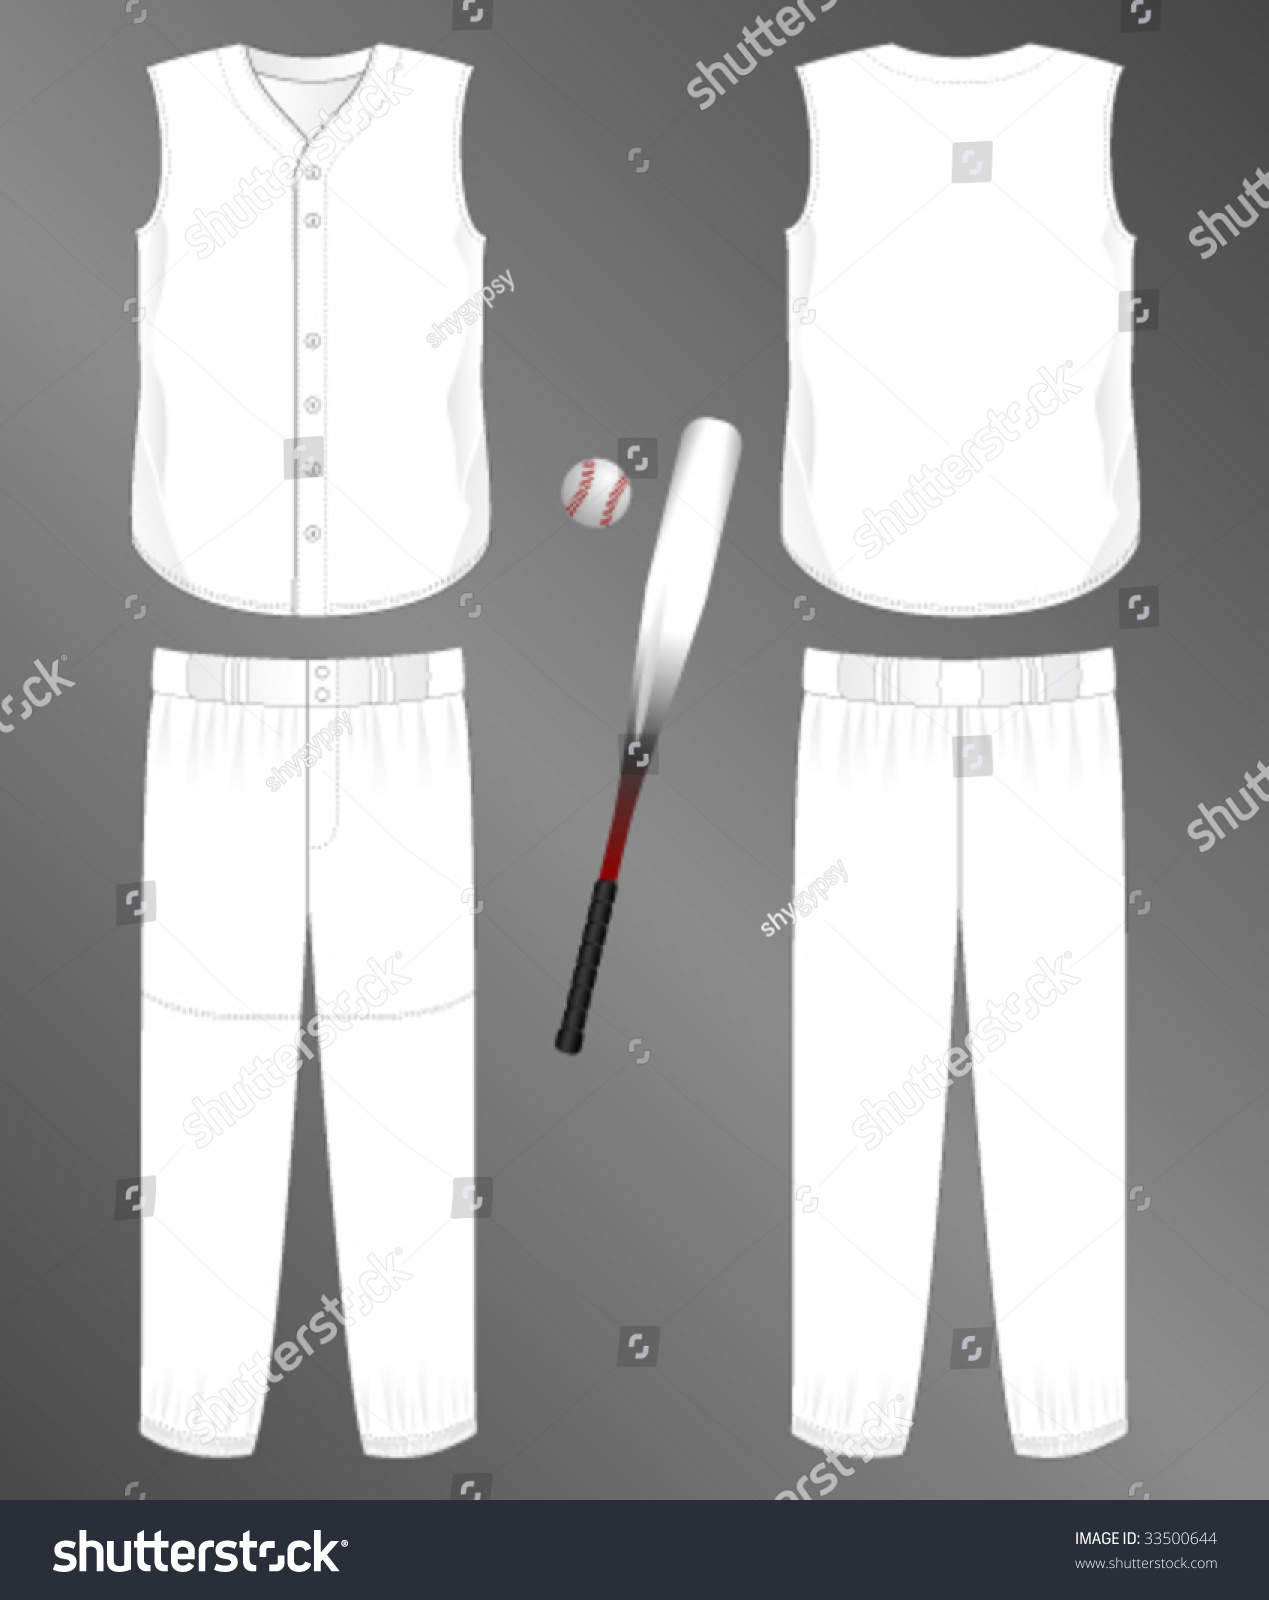 pants template uniform related keywords pants template uniform long tail keywords keywordsking. Black Bedroom Furniture Sets. Home Design Ideas